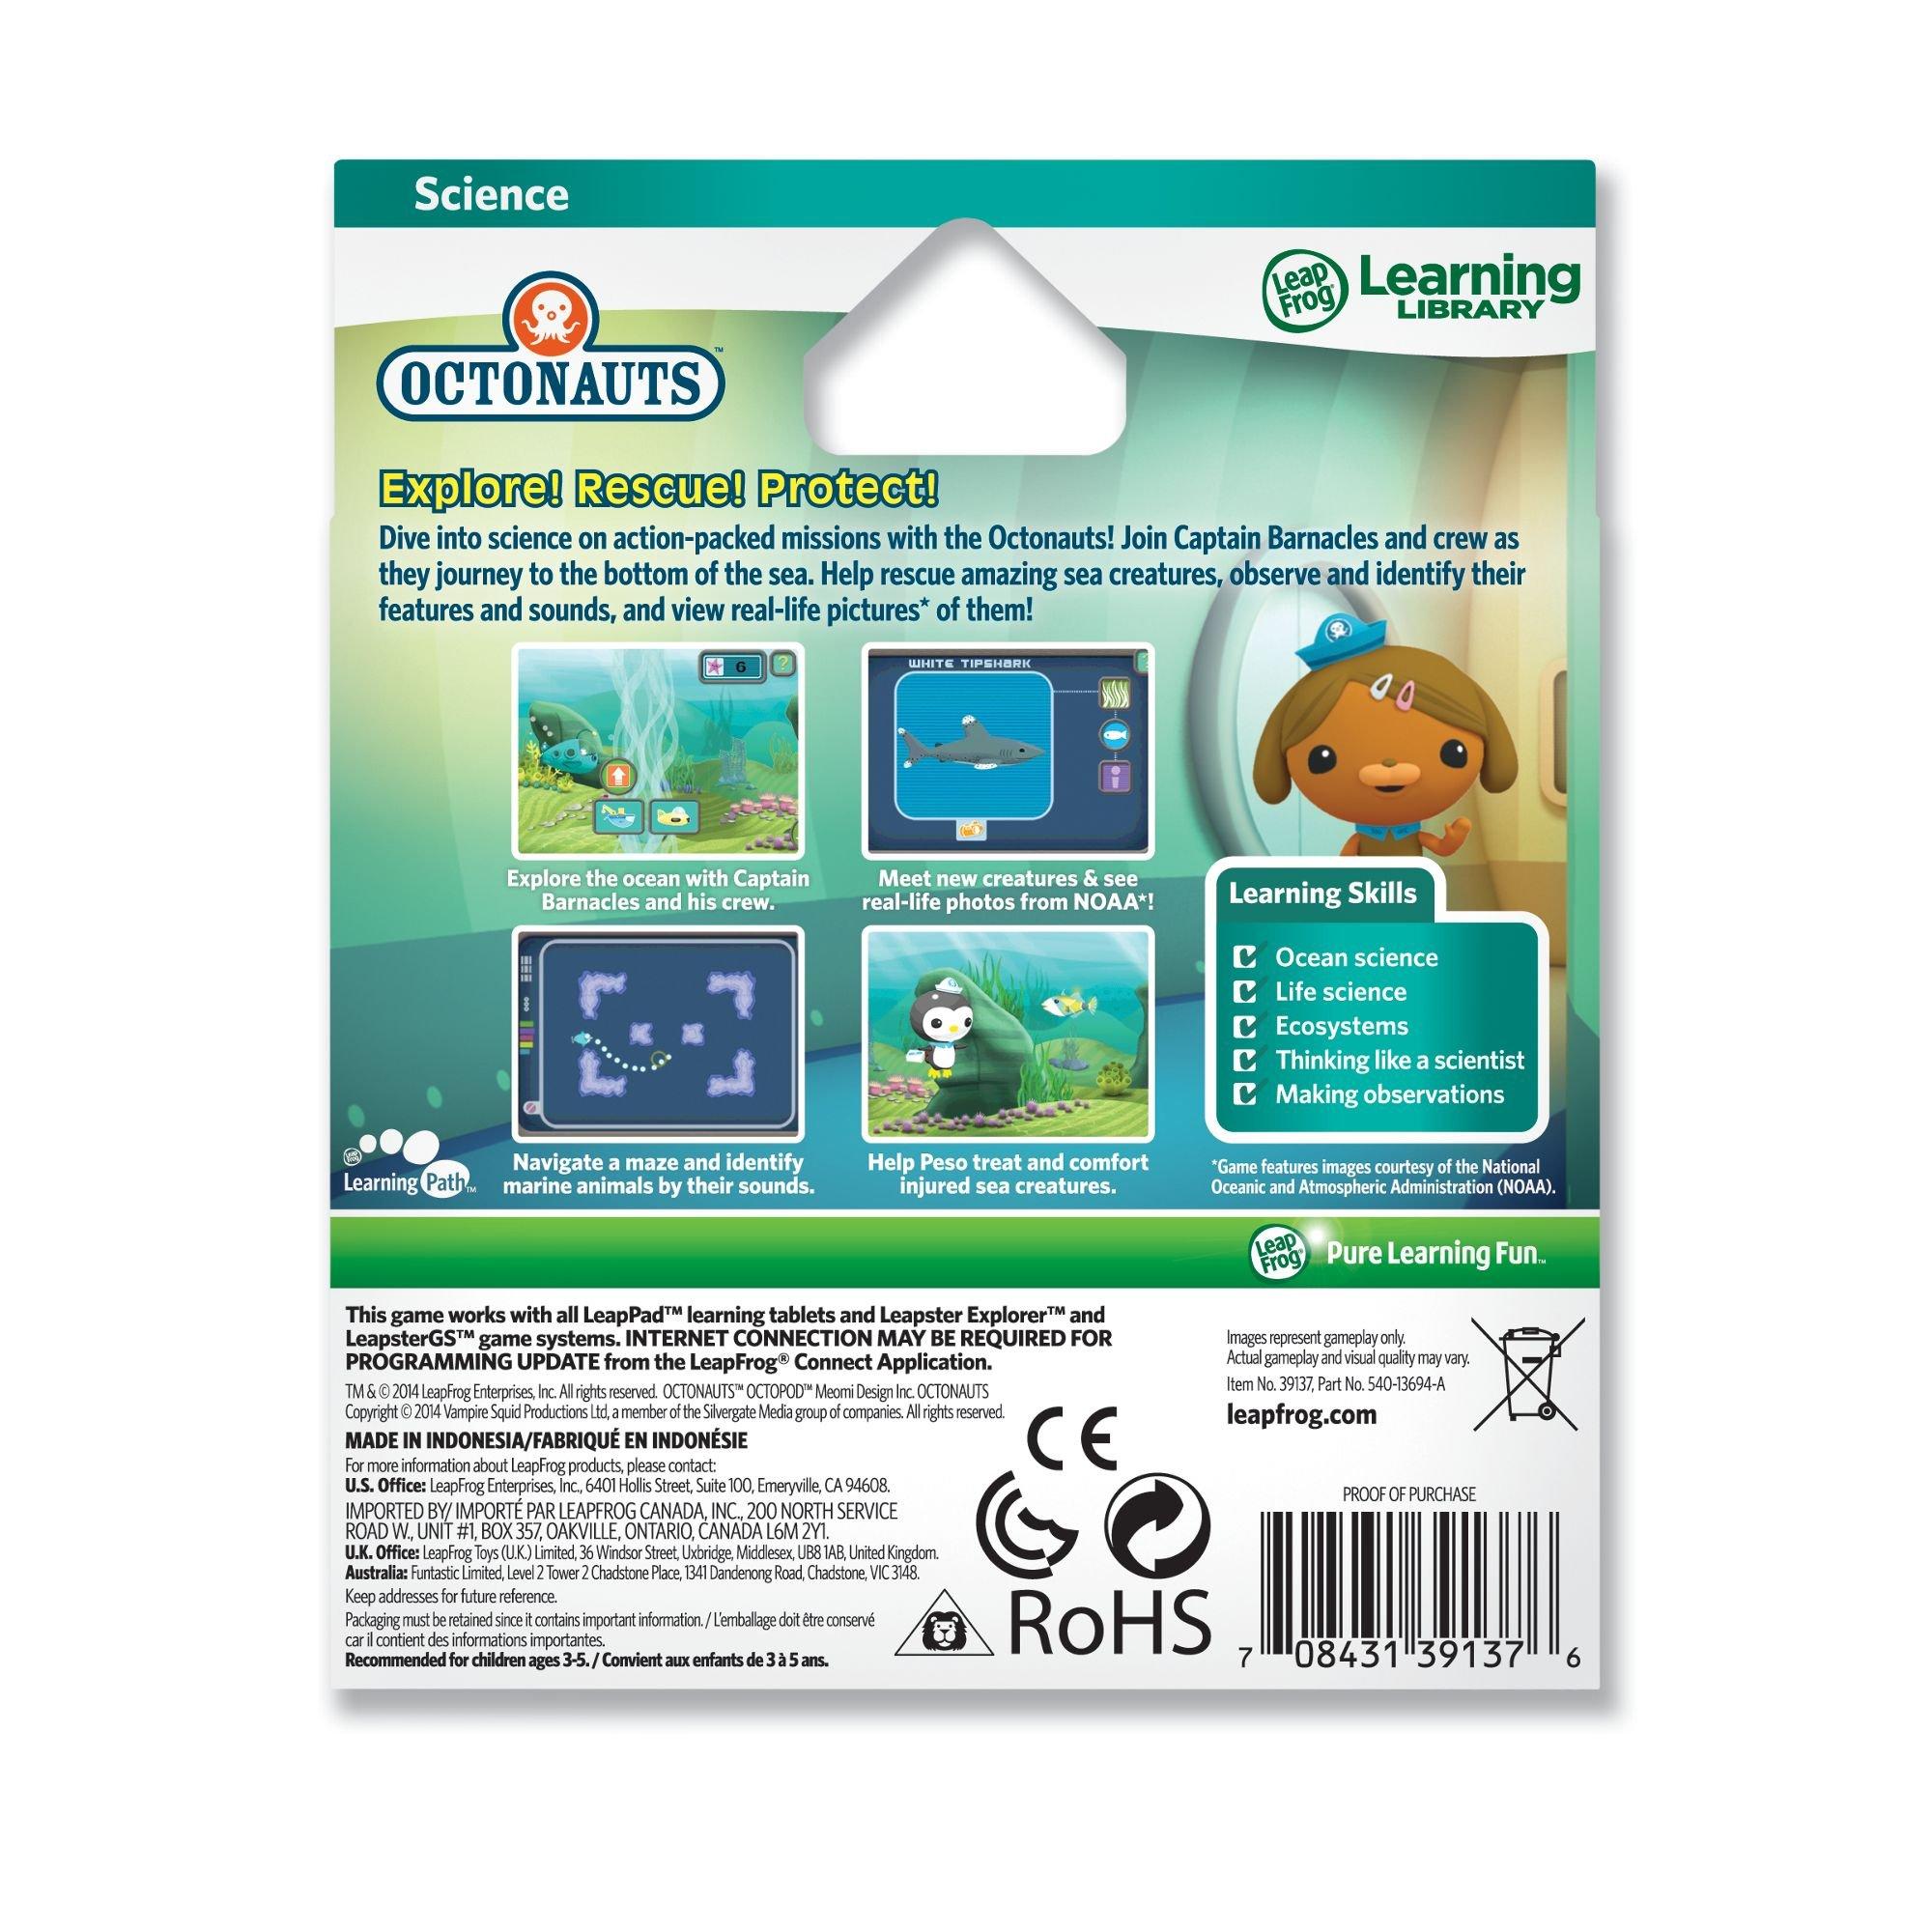 LeapFrog Science Learning Game Disney Octonauts for LeapPad Platinum, LeapPad Ultra, LeapPad1, LeapPad2, LeapPad3, Leapster Explorer, LeapsterGS Explorer by LeapFrog (Image #2)